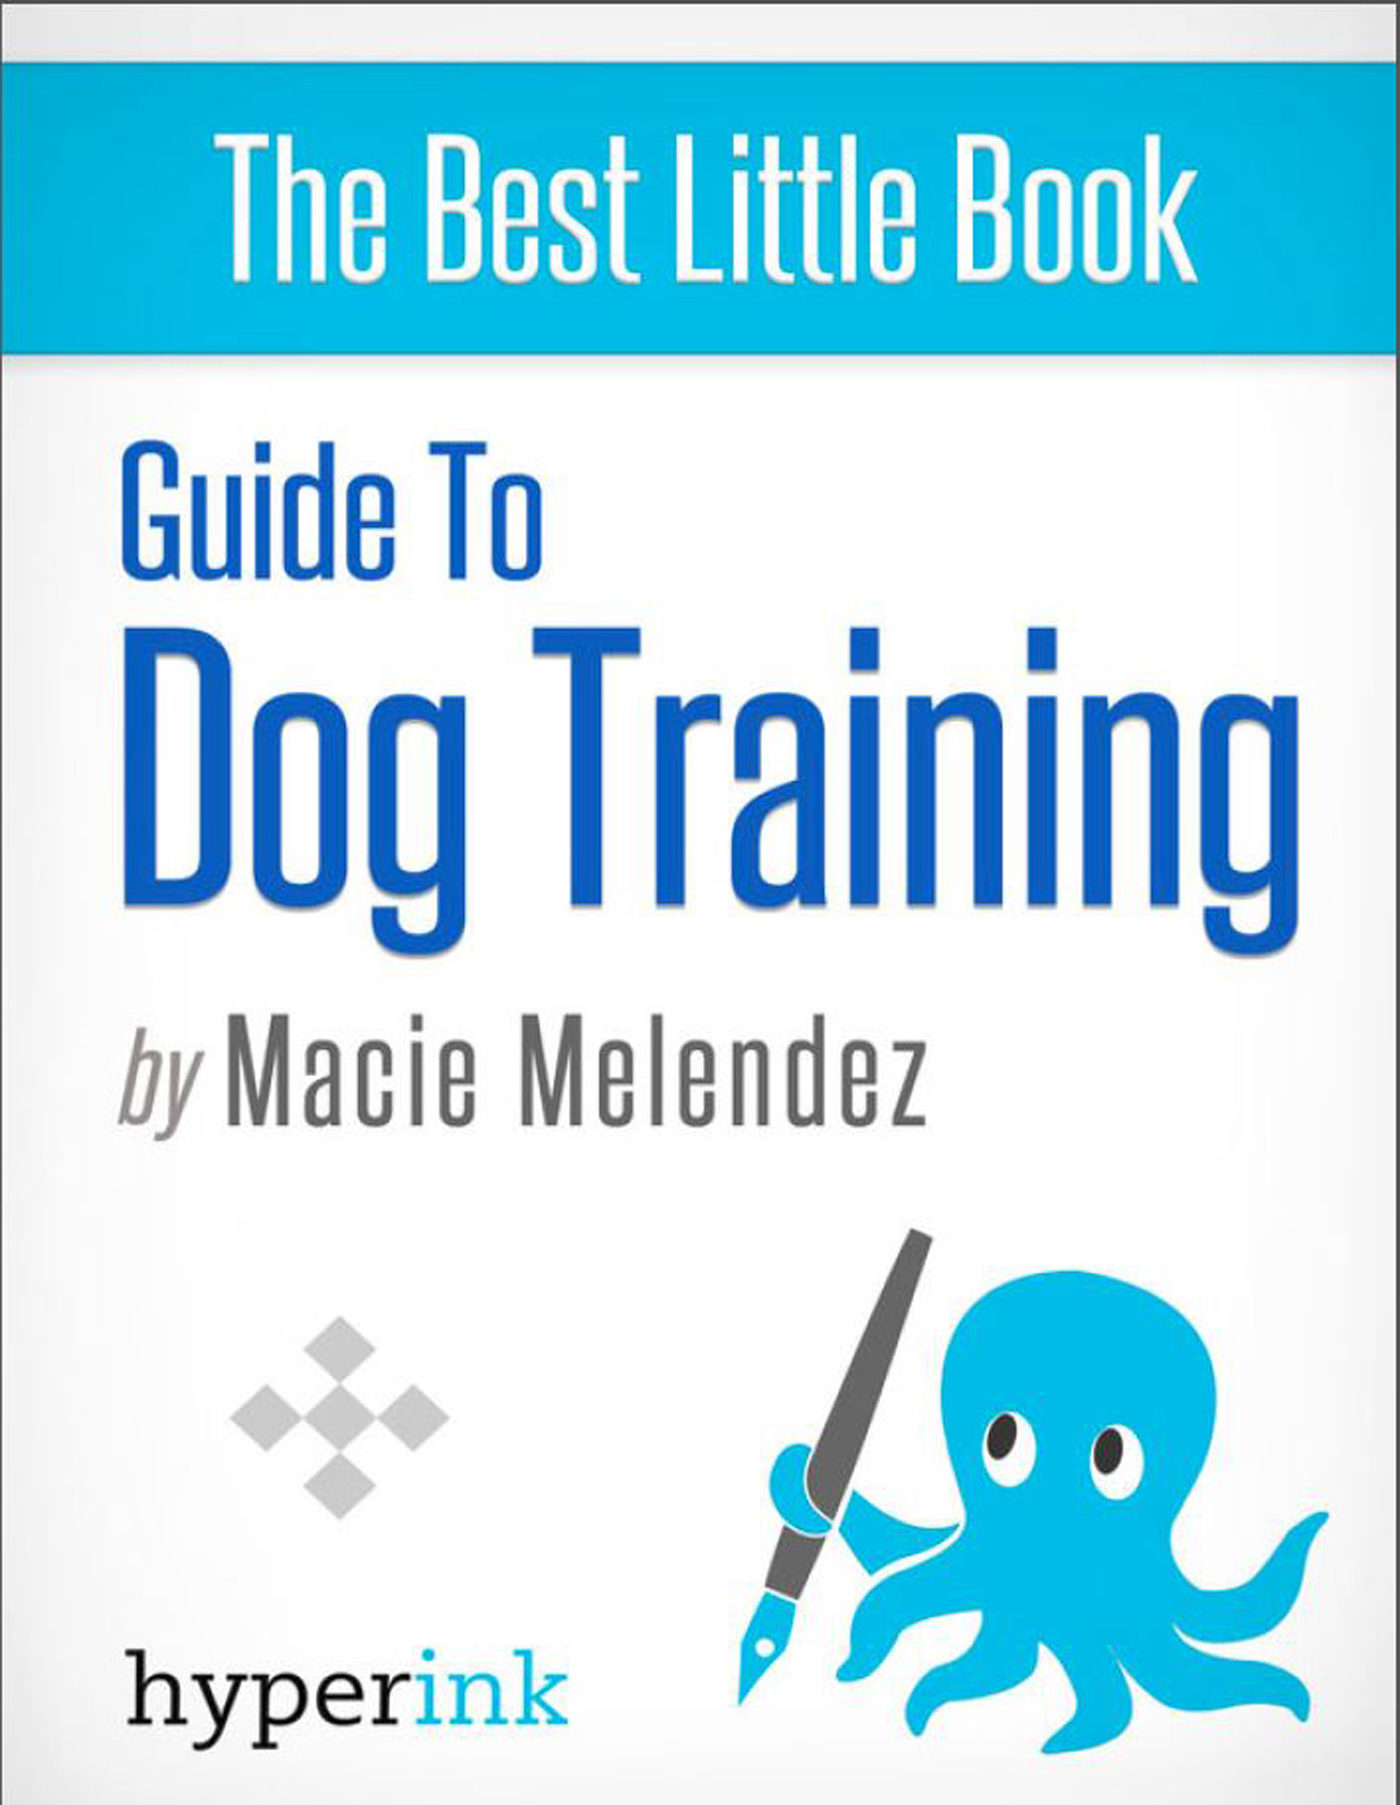 dog training: how to tame a dog like cesar millan (ebook)-macie melendez-9781614649427